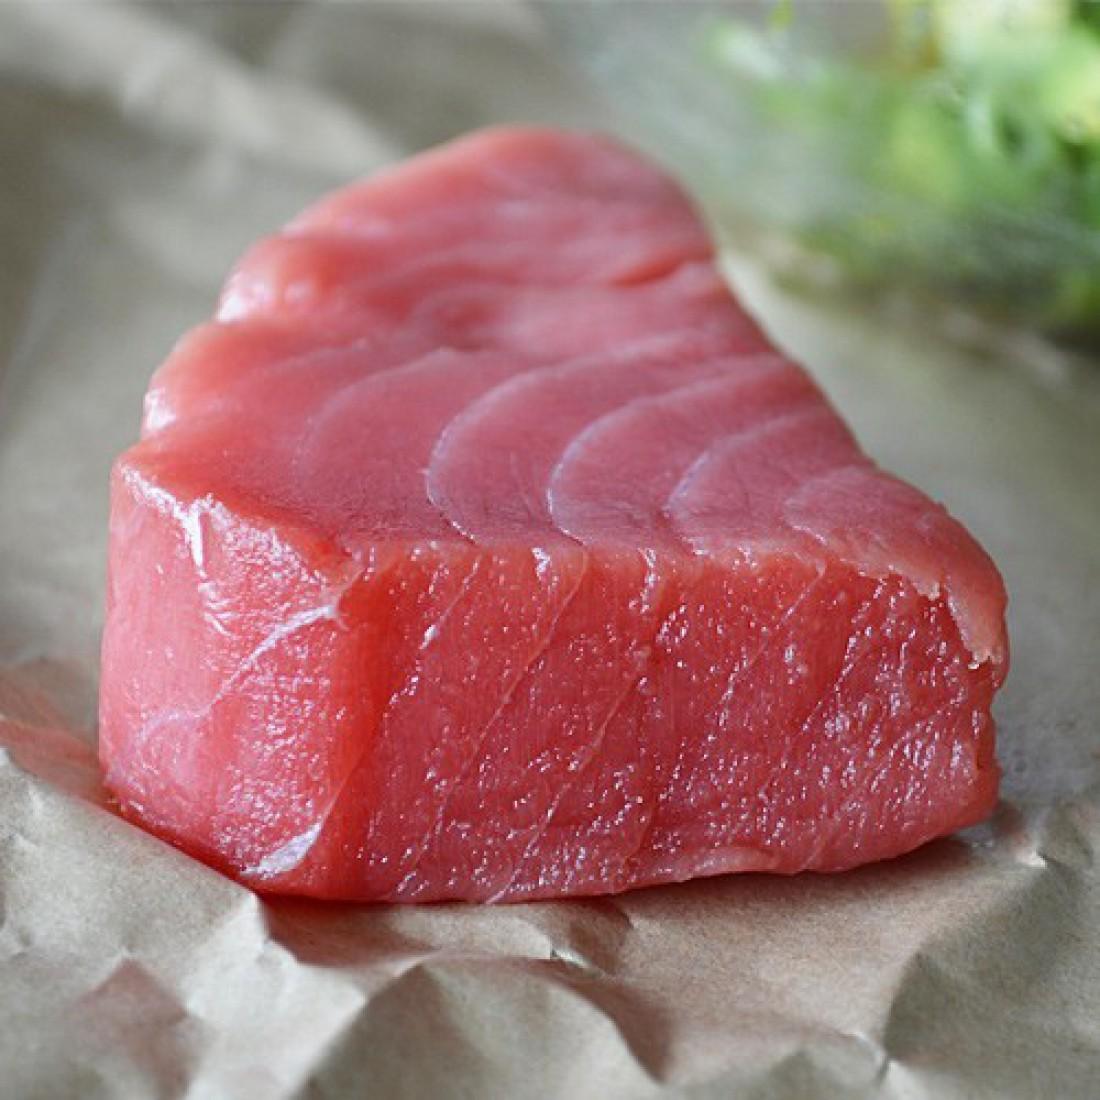 Не хватает энергии? Нажимай на мясо тунца